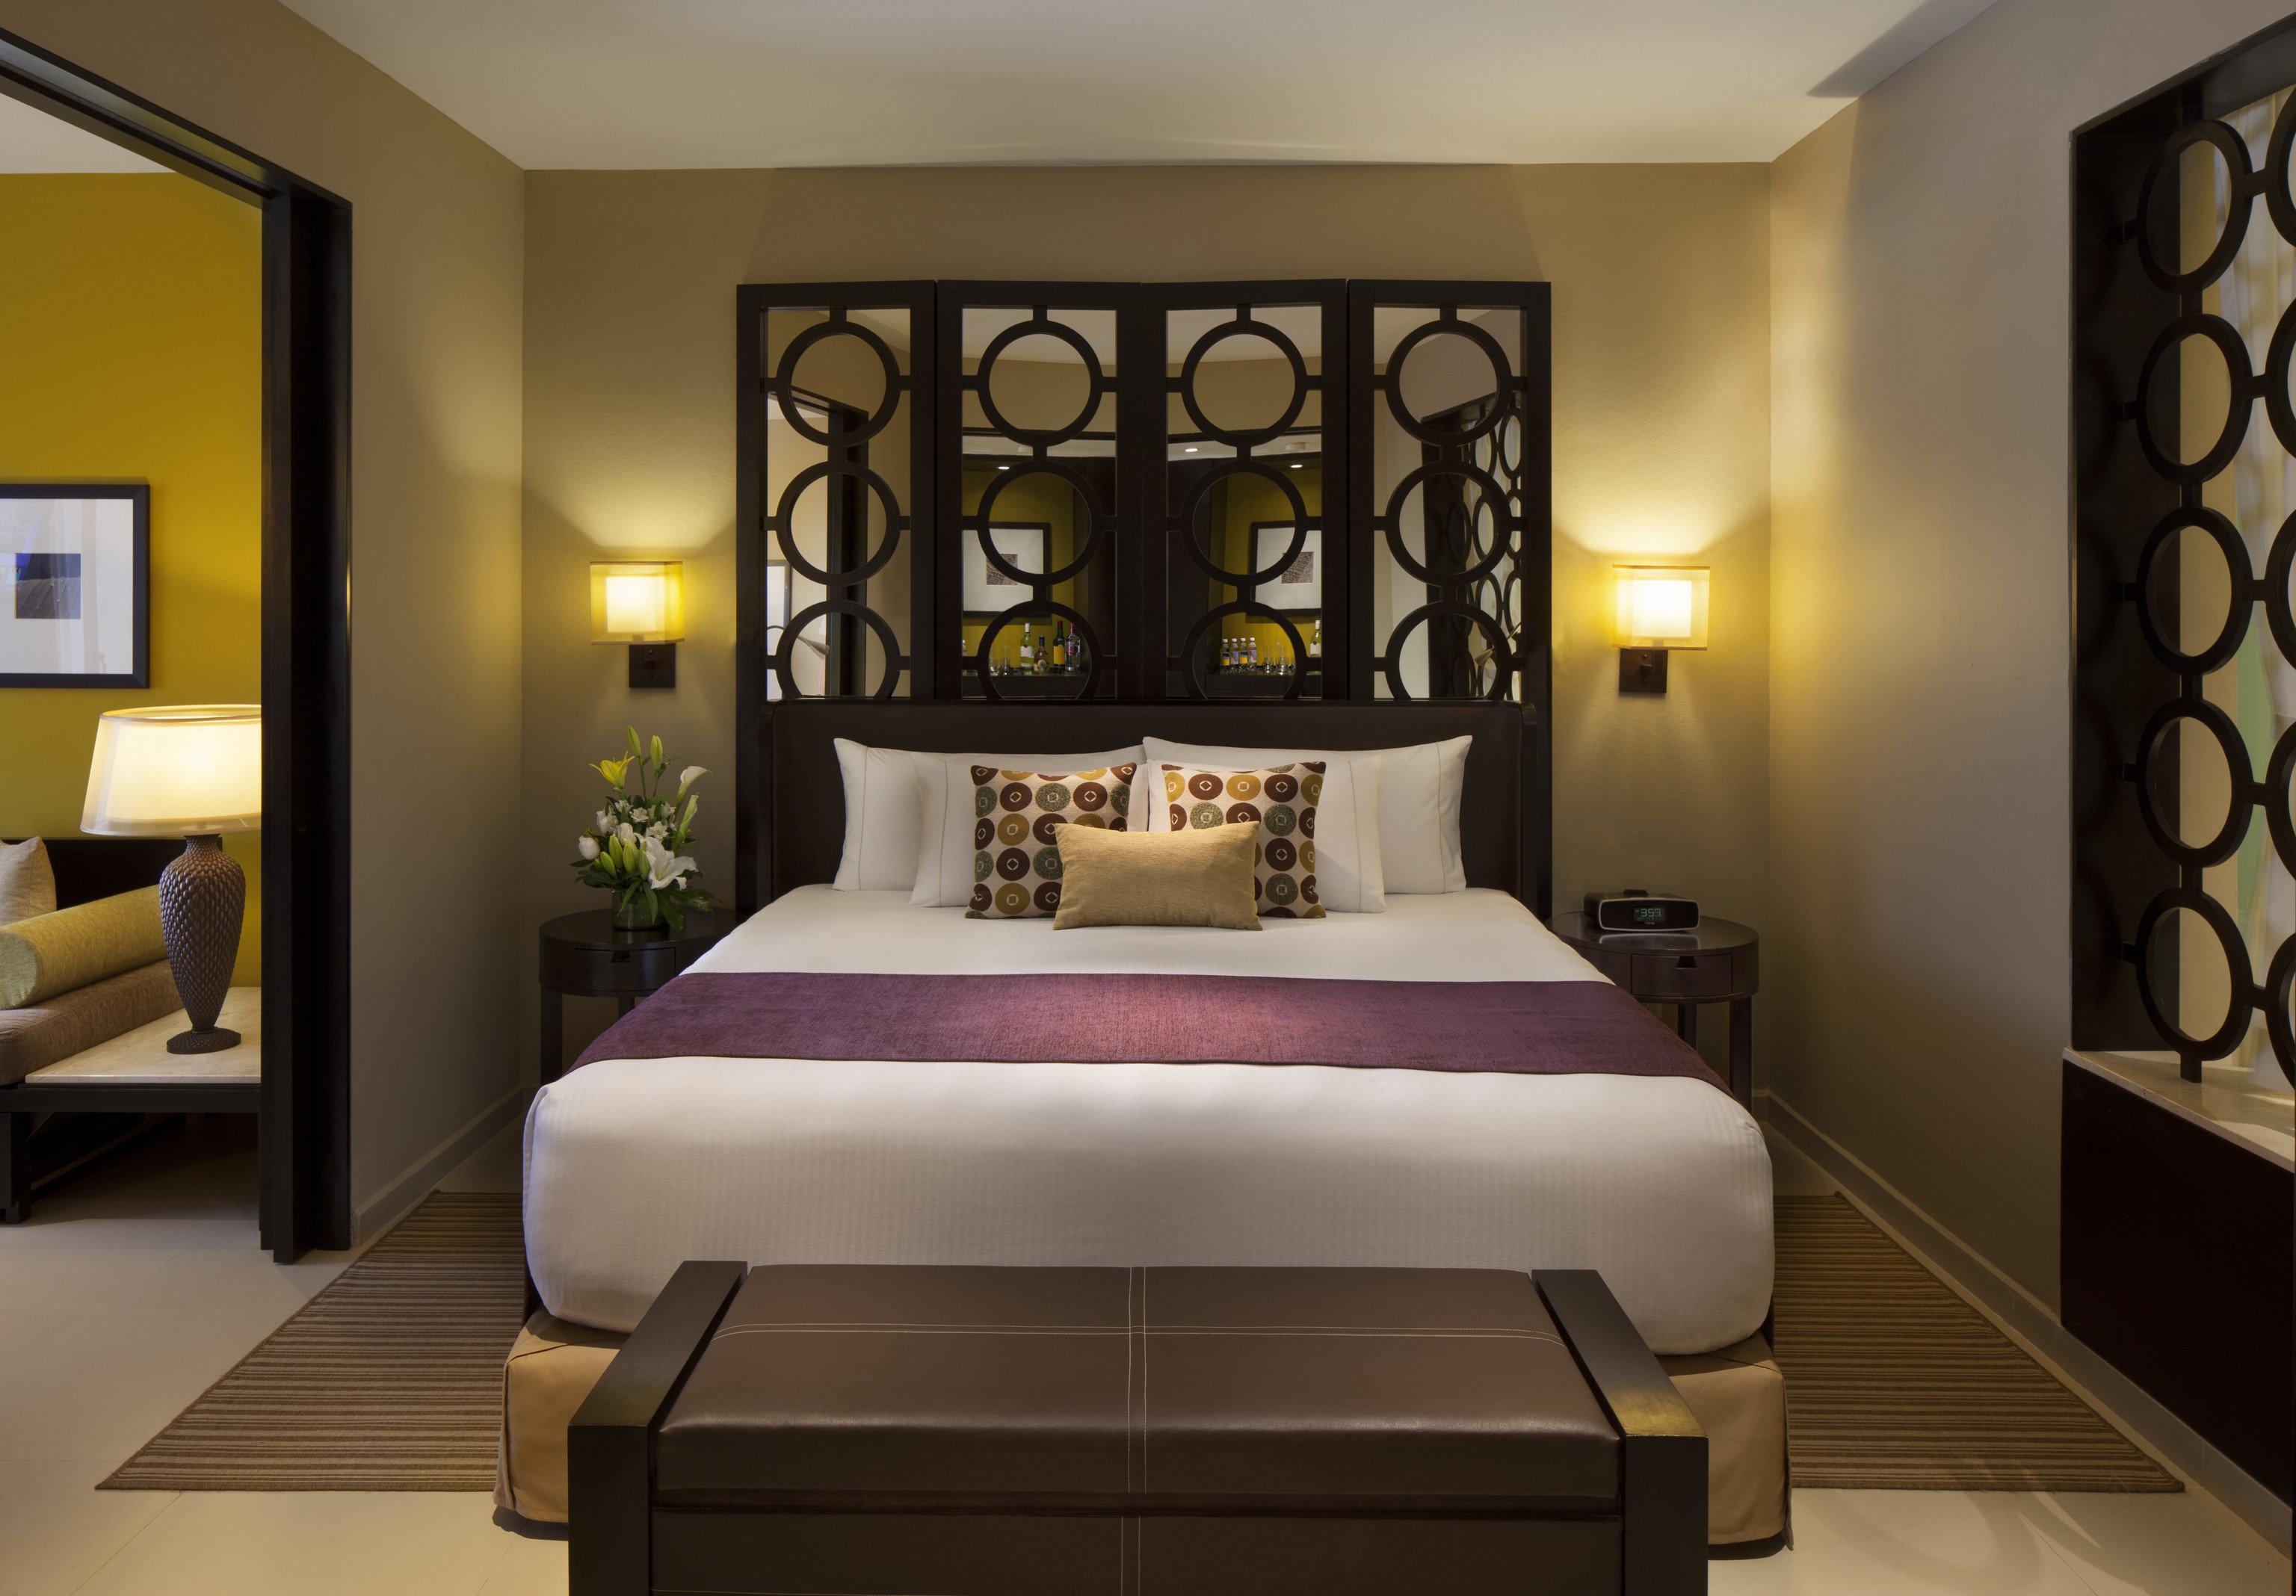 All-Inclusive Resorts Family Travel Hotels wall indoor floor room bed ceiling interior design Suite bed frame Bedroom furniture hotel interior designer